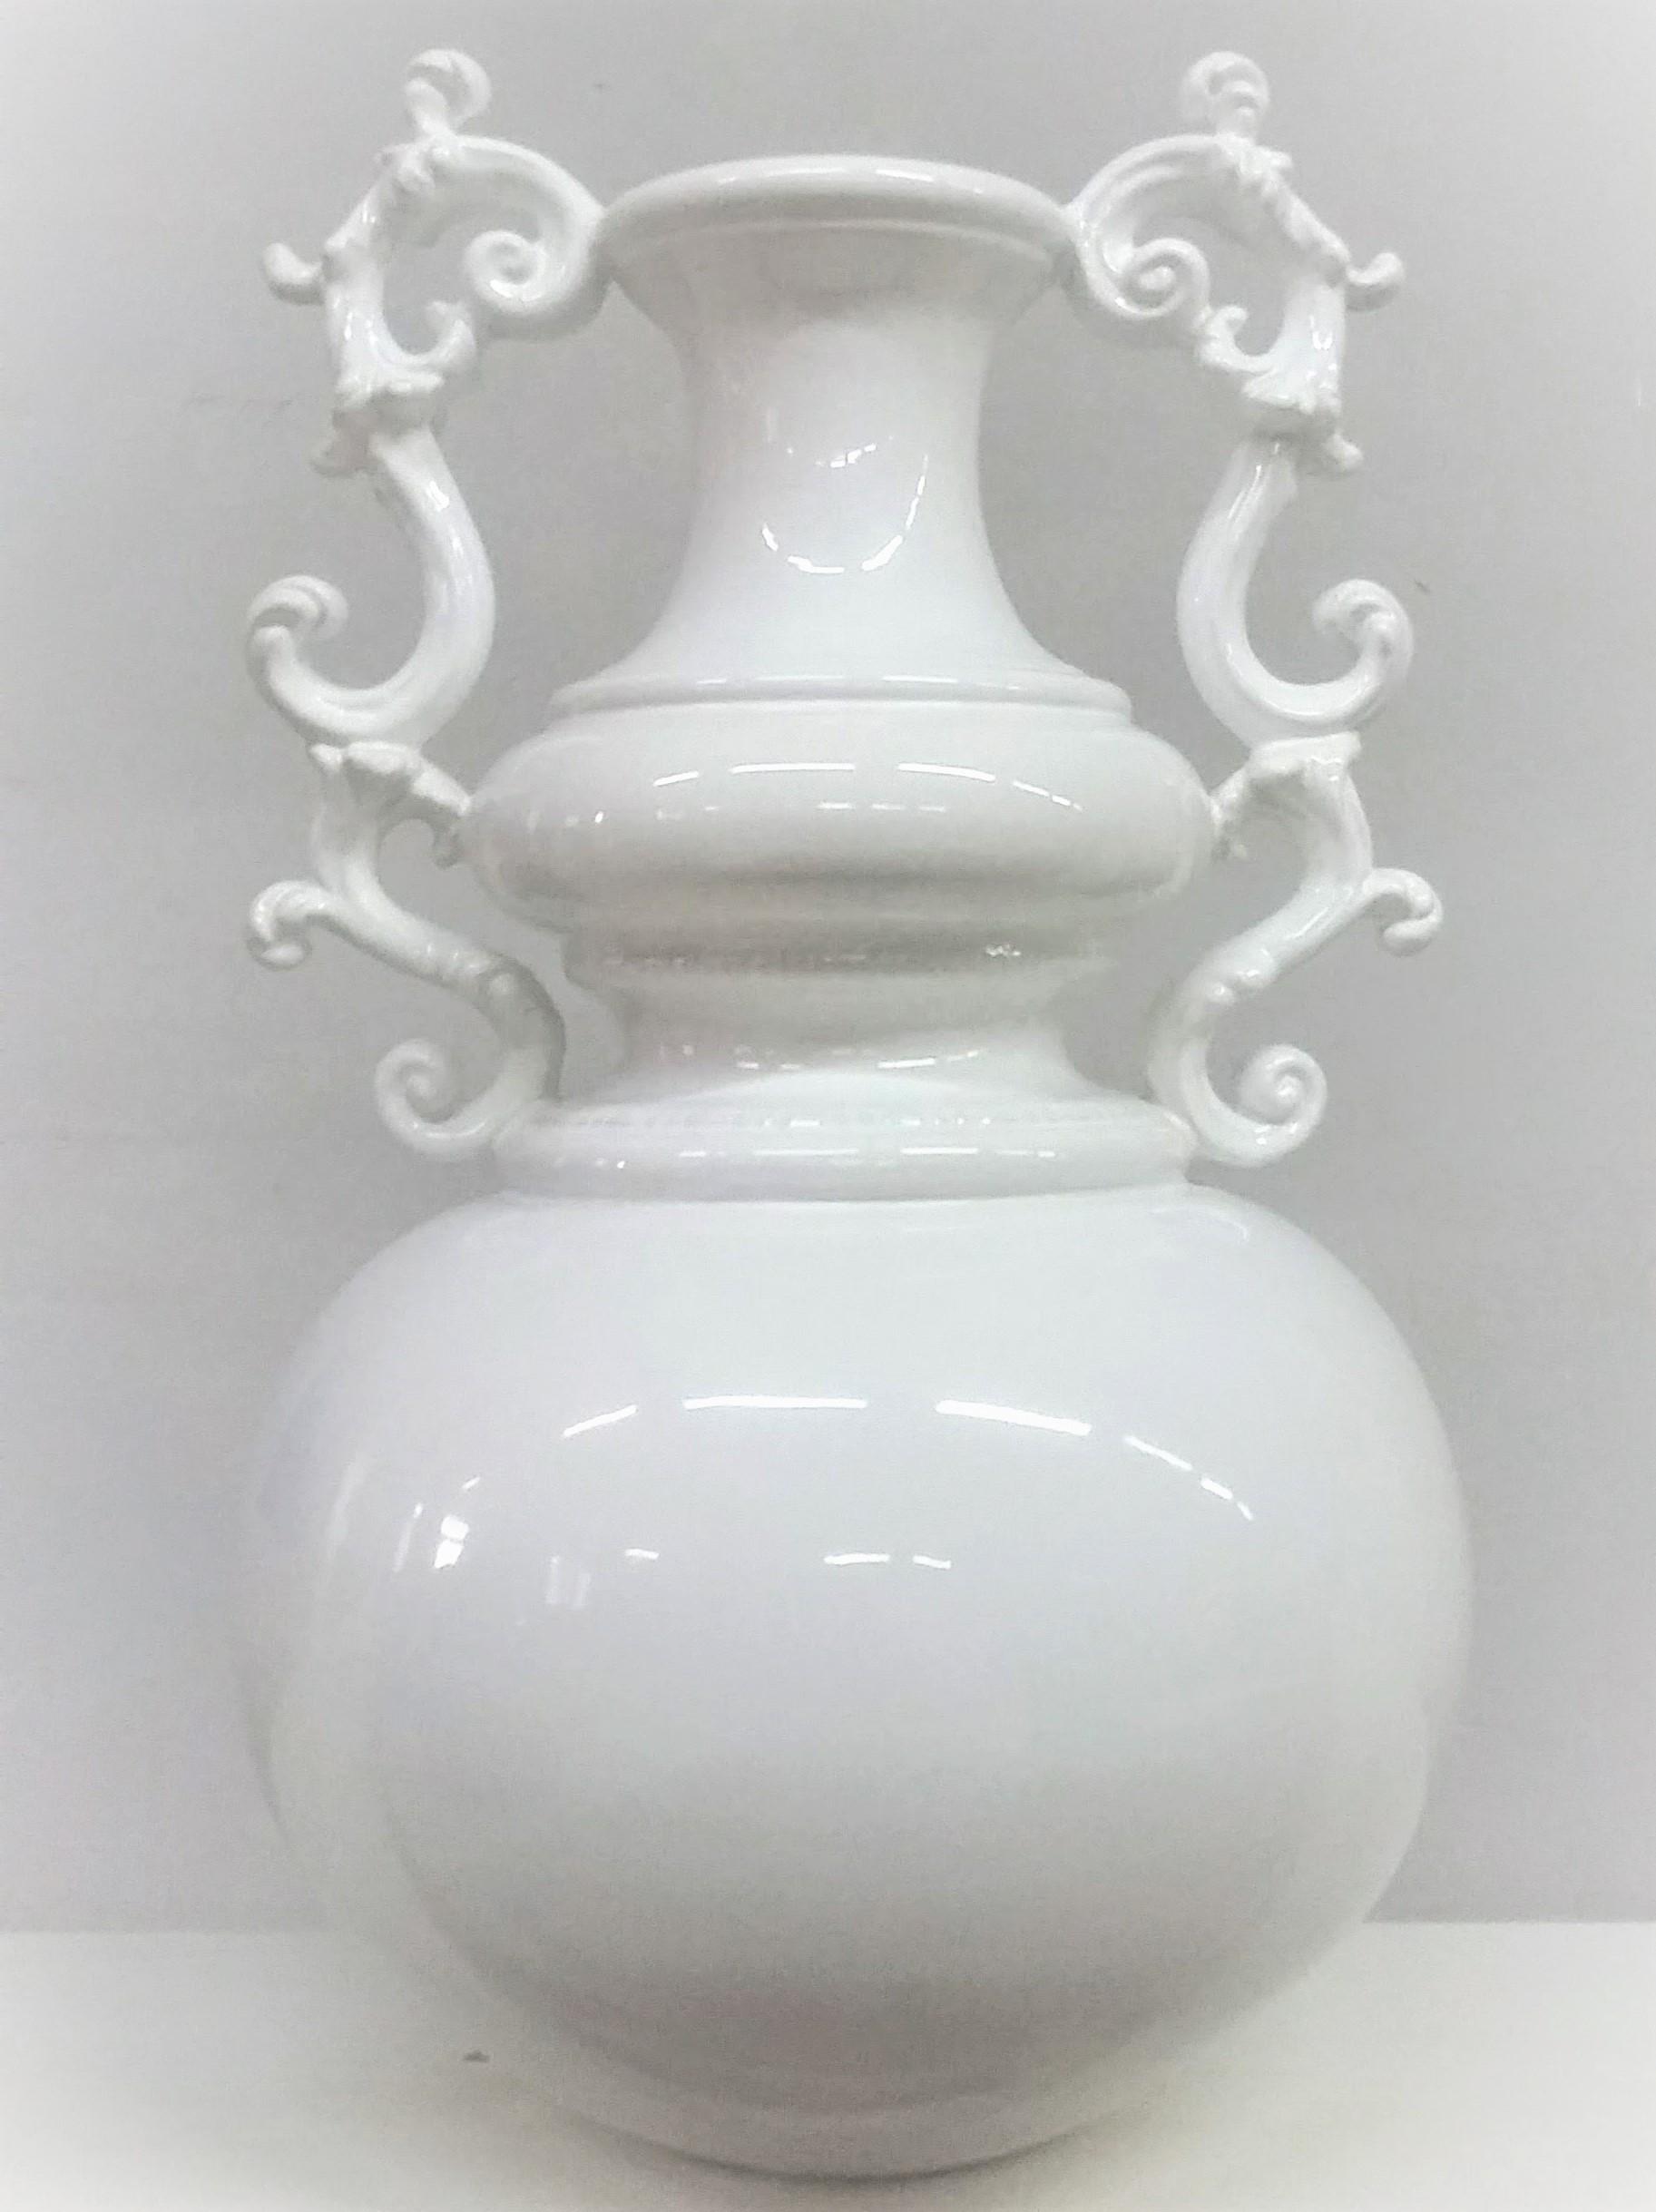 Vaso bianco restaurato